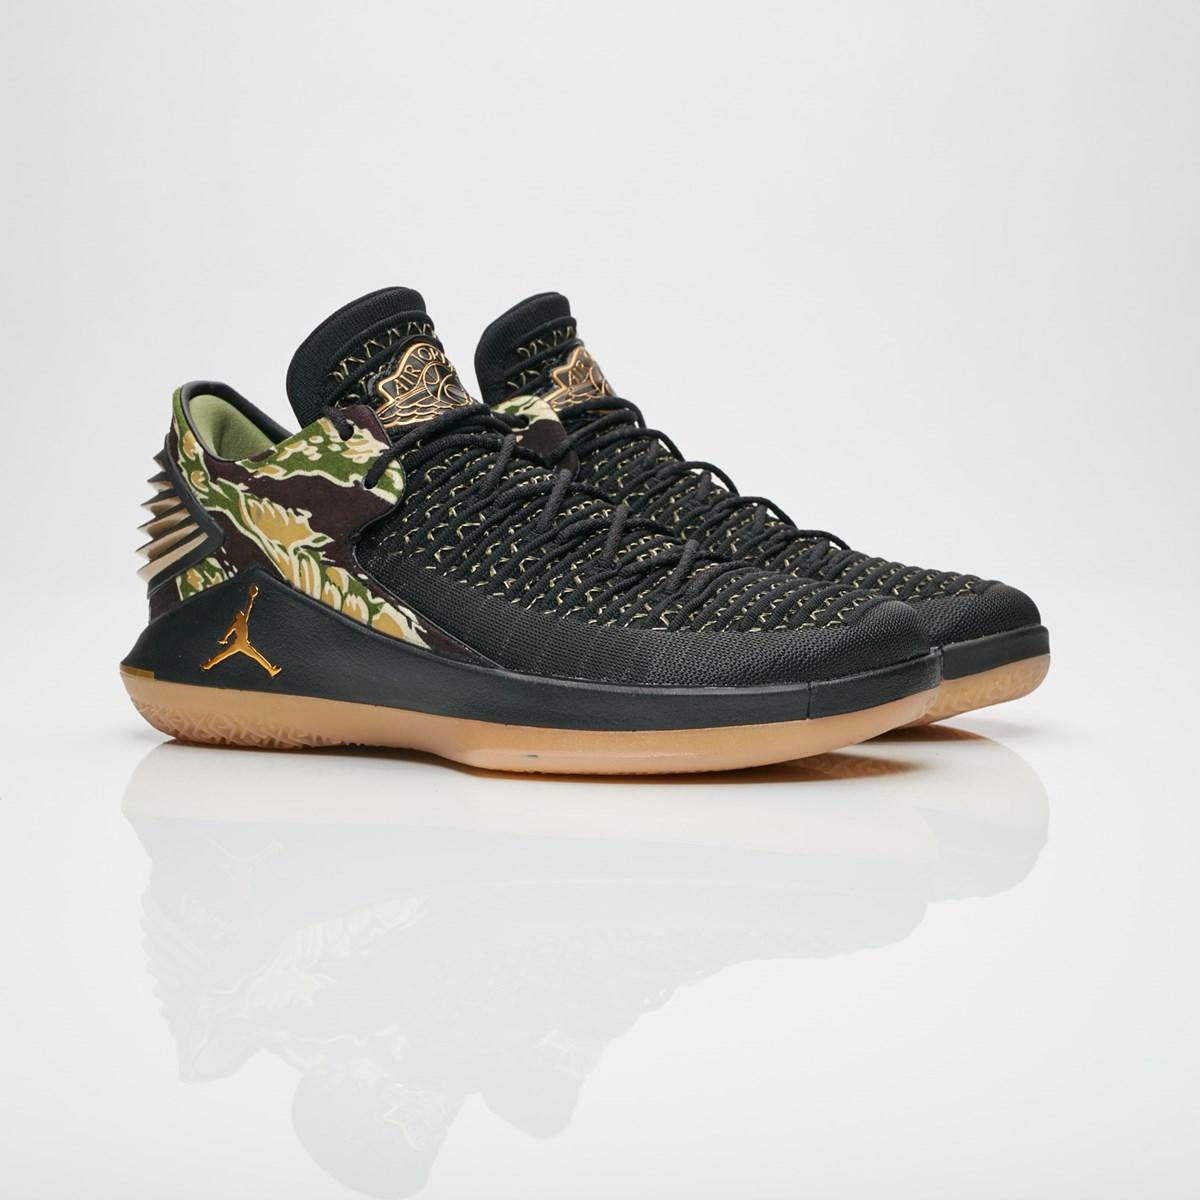 uk availability 6a3bf b579e jordan brand air xxxii low aa1256 021 sneakers   streetwear på nätet sen  1999